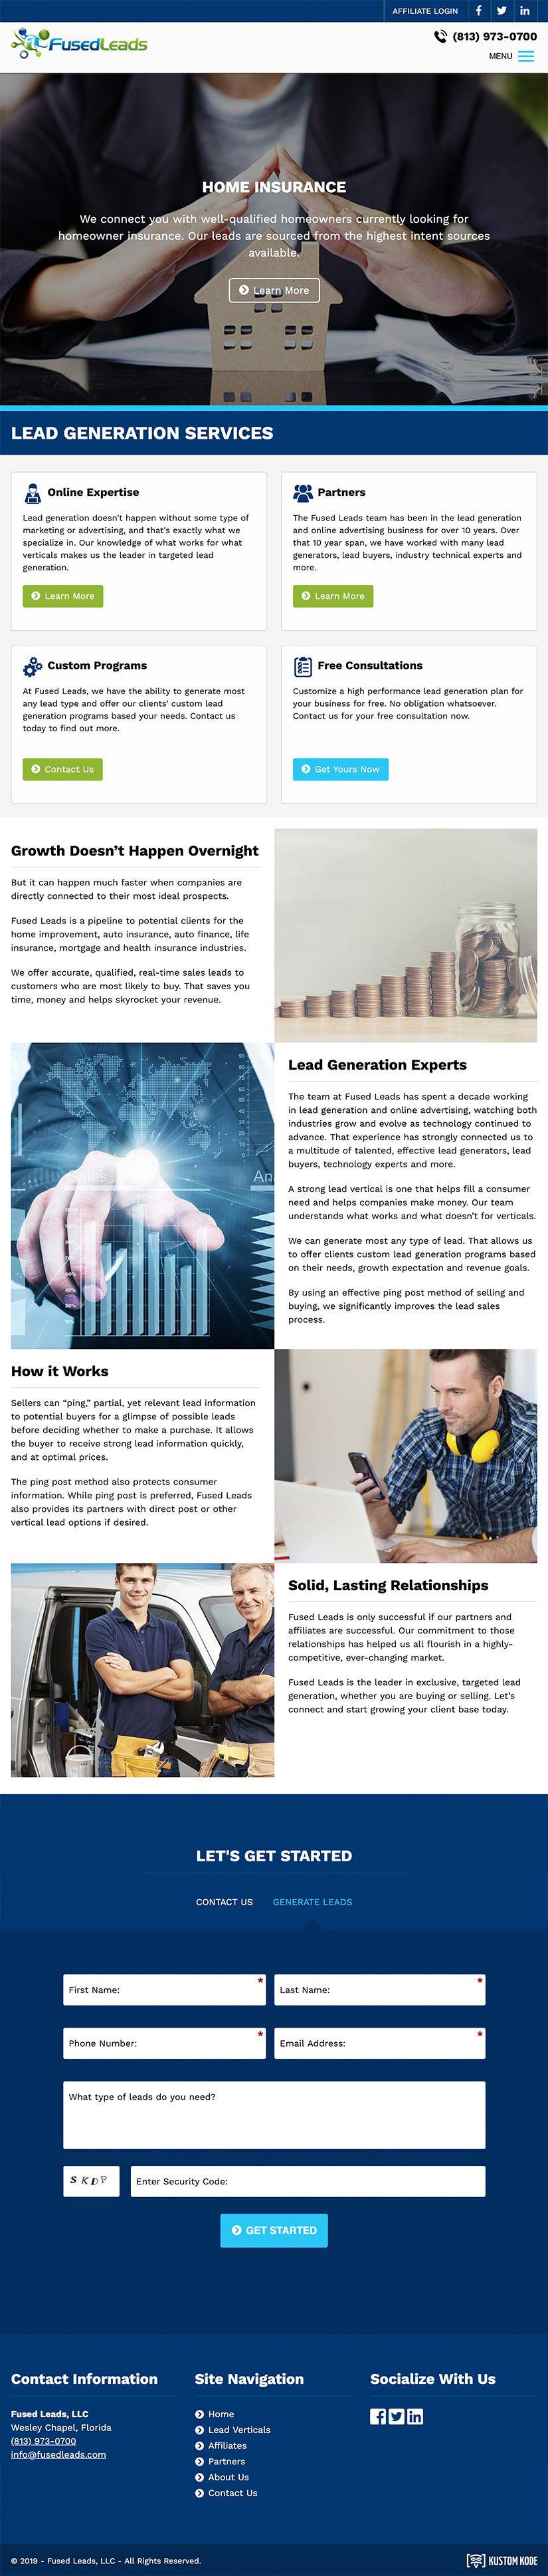 Web Design for a Lead Generation Company